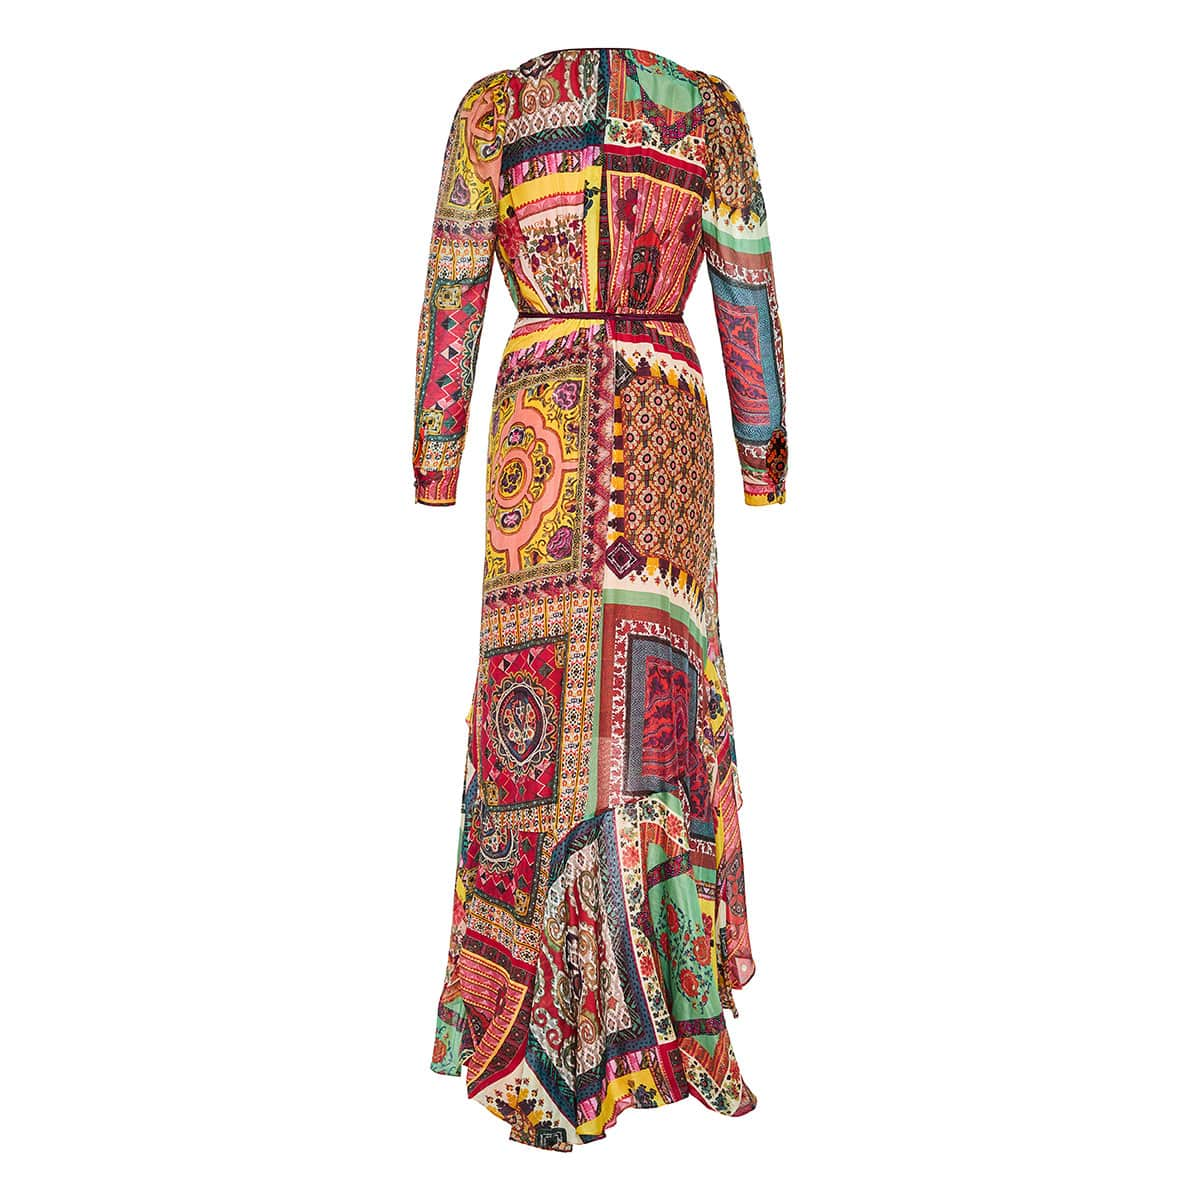 Patchwork print asymmetric ruffled wrap dressPatchwork print asymmetric ruffled wrap dress